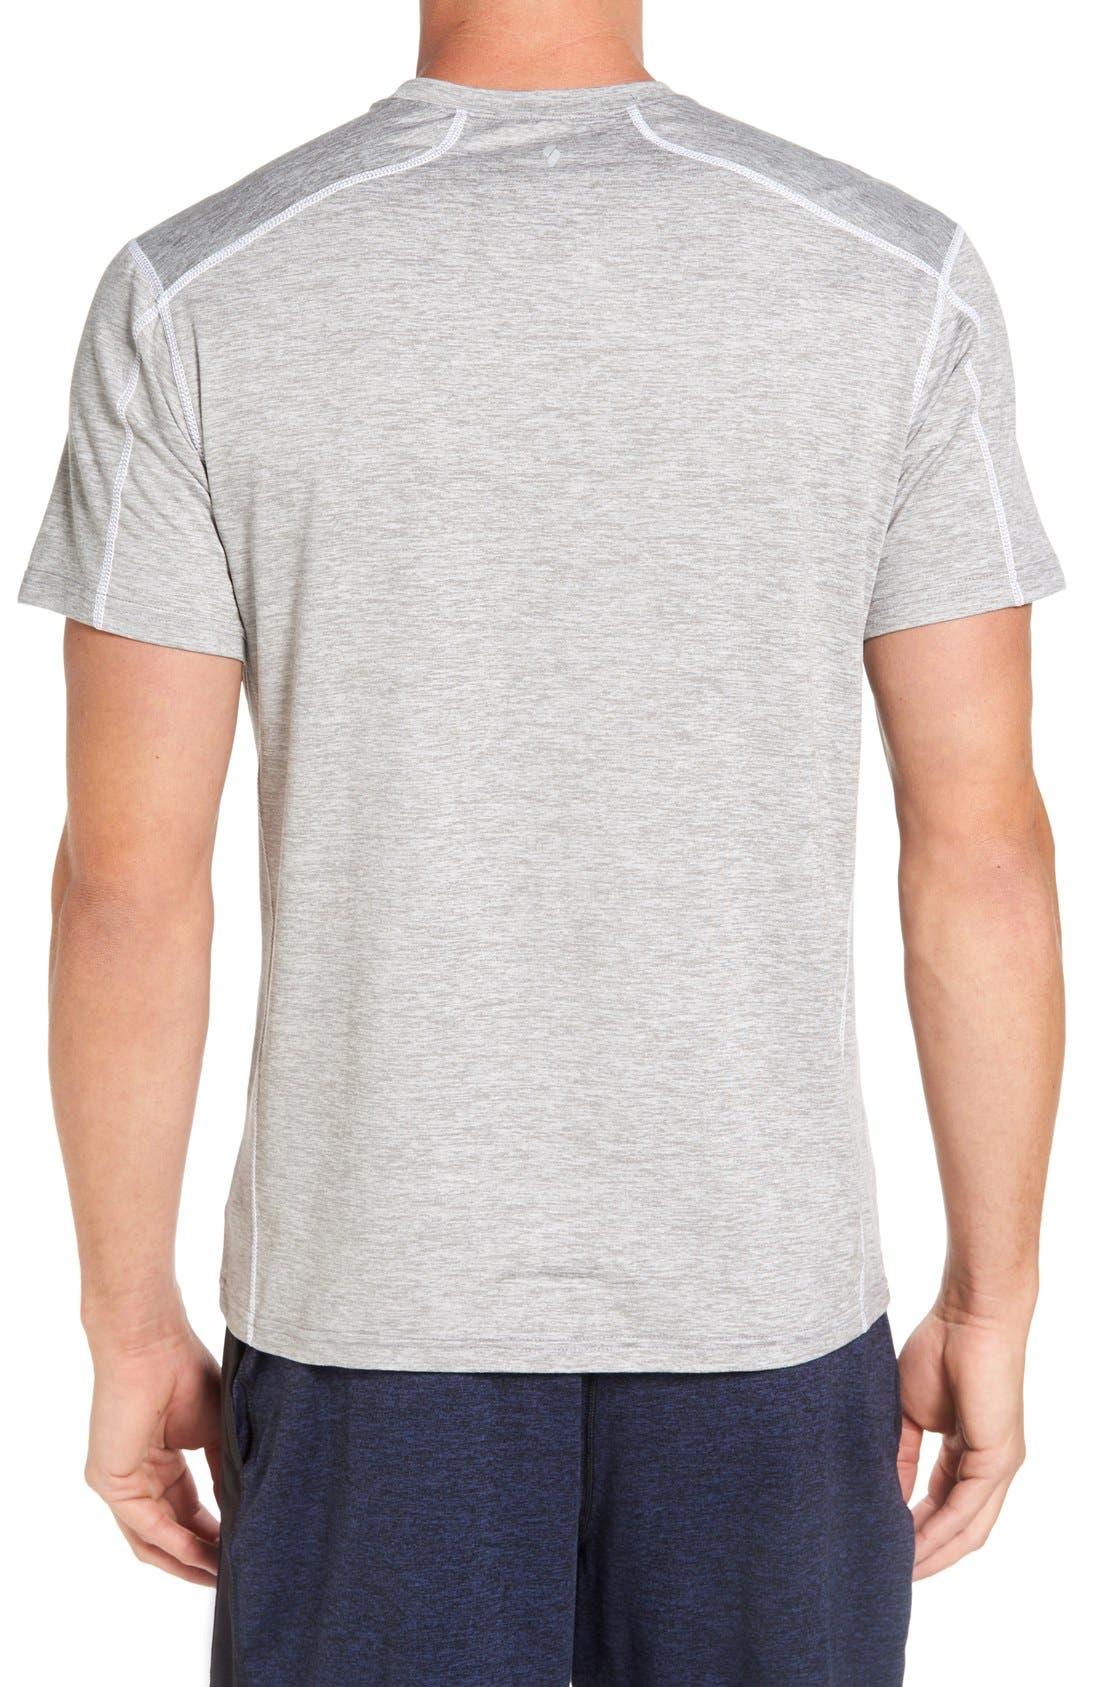 'Cooldown' Moisture Wicking Training T-Shirt,                             Alternate thumbnail 2, color,                             030